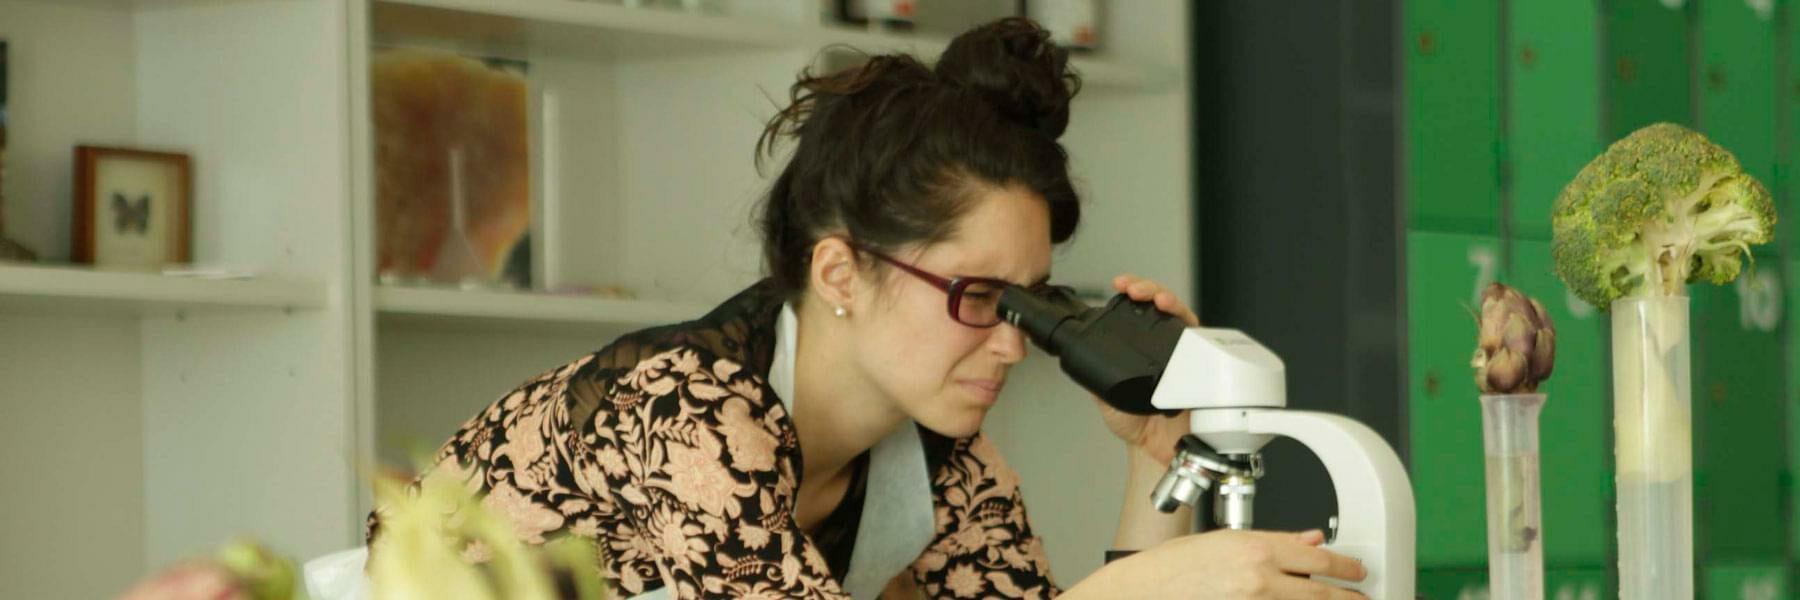 Joven mirando en un estetoscopio